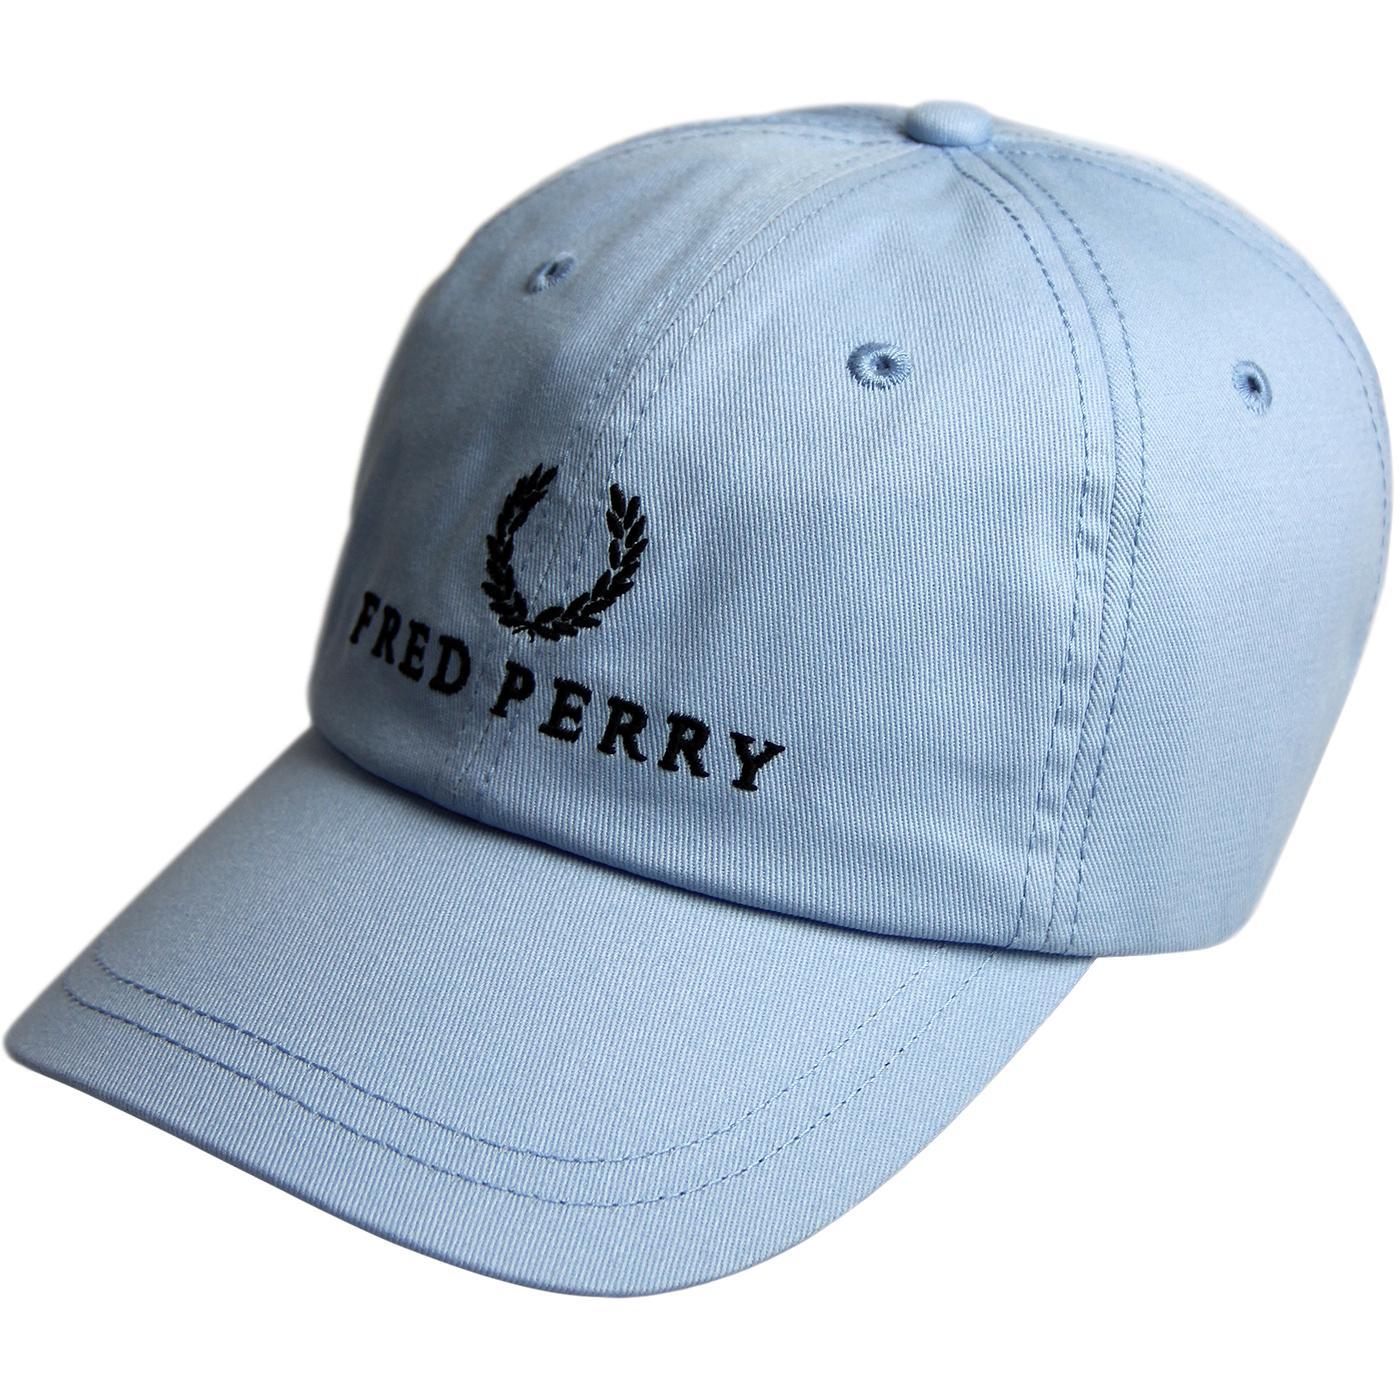 FRED PERRY Retro 90s Tennis Baseball Cap (Glacier)